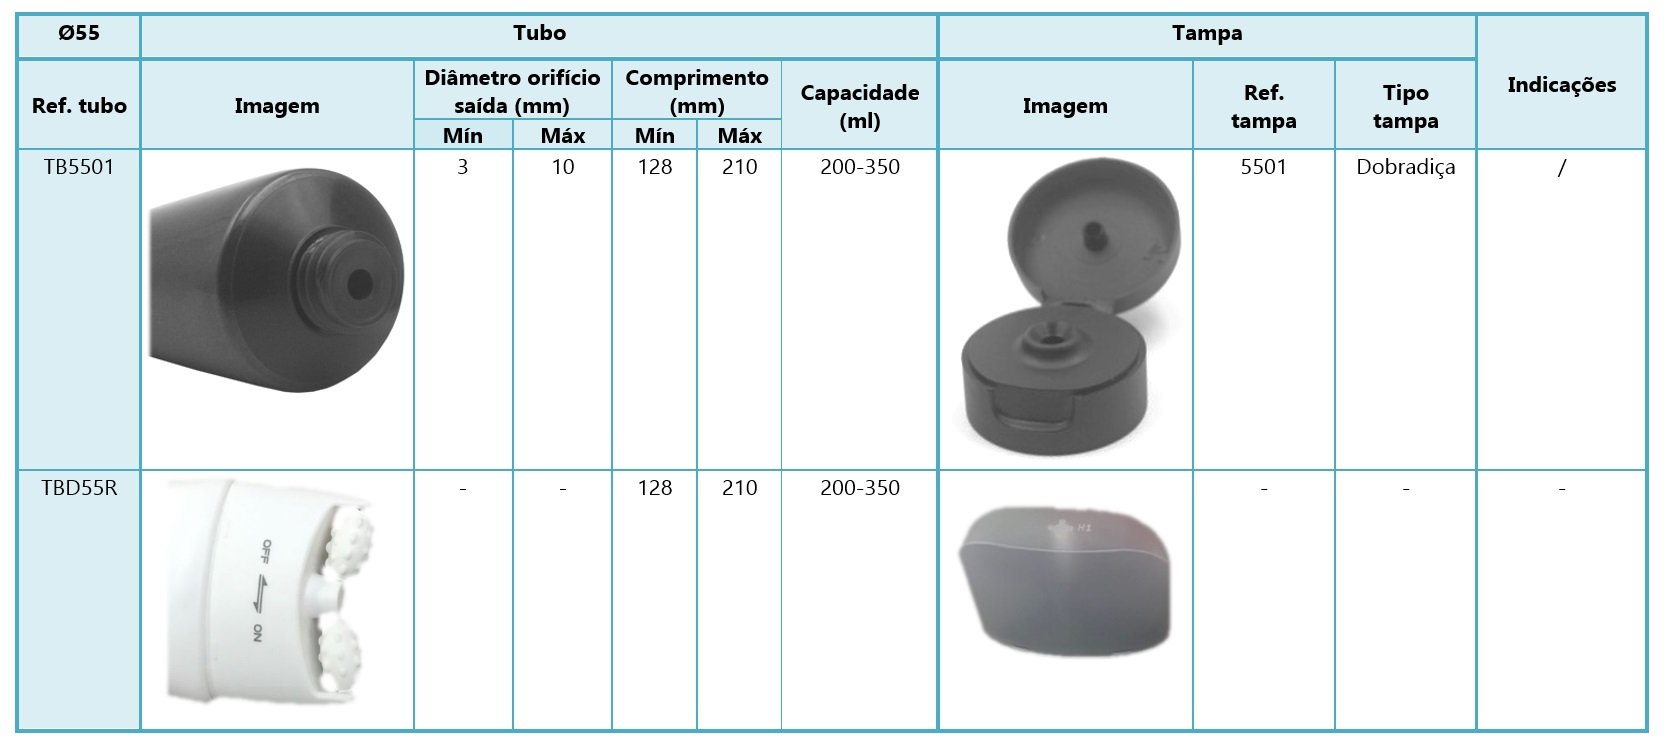 Tubos diâmetro 55mm